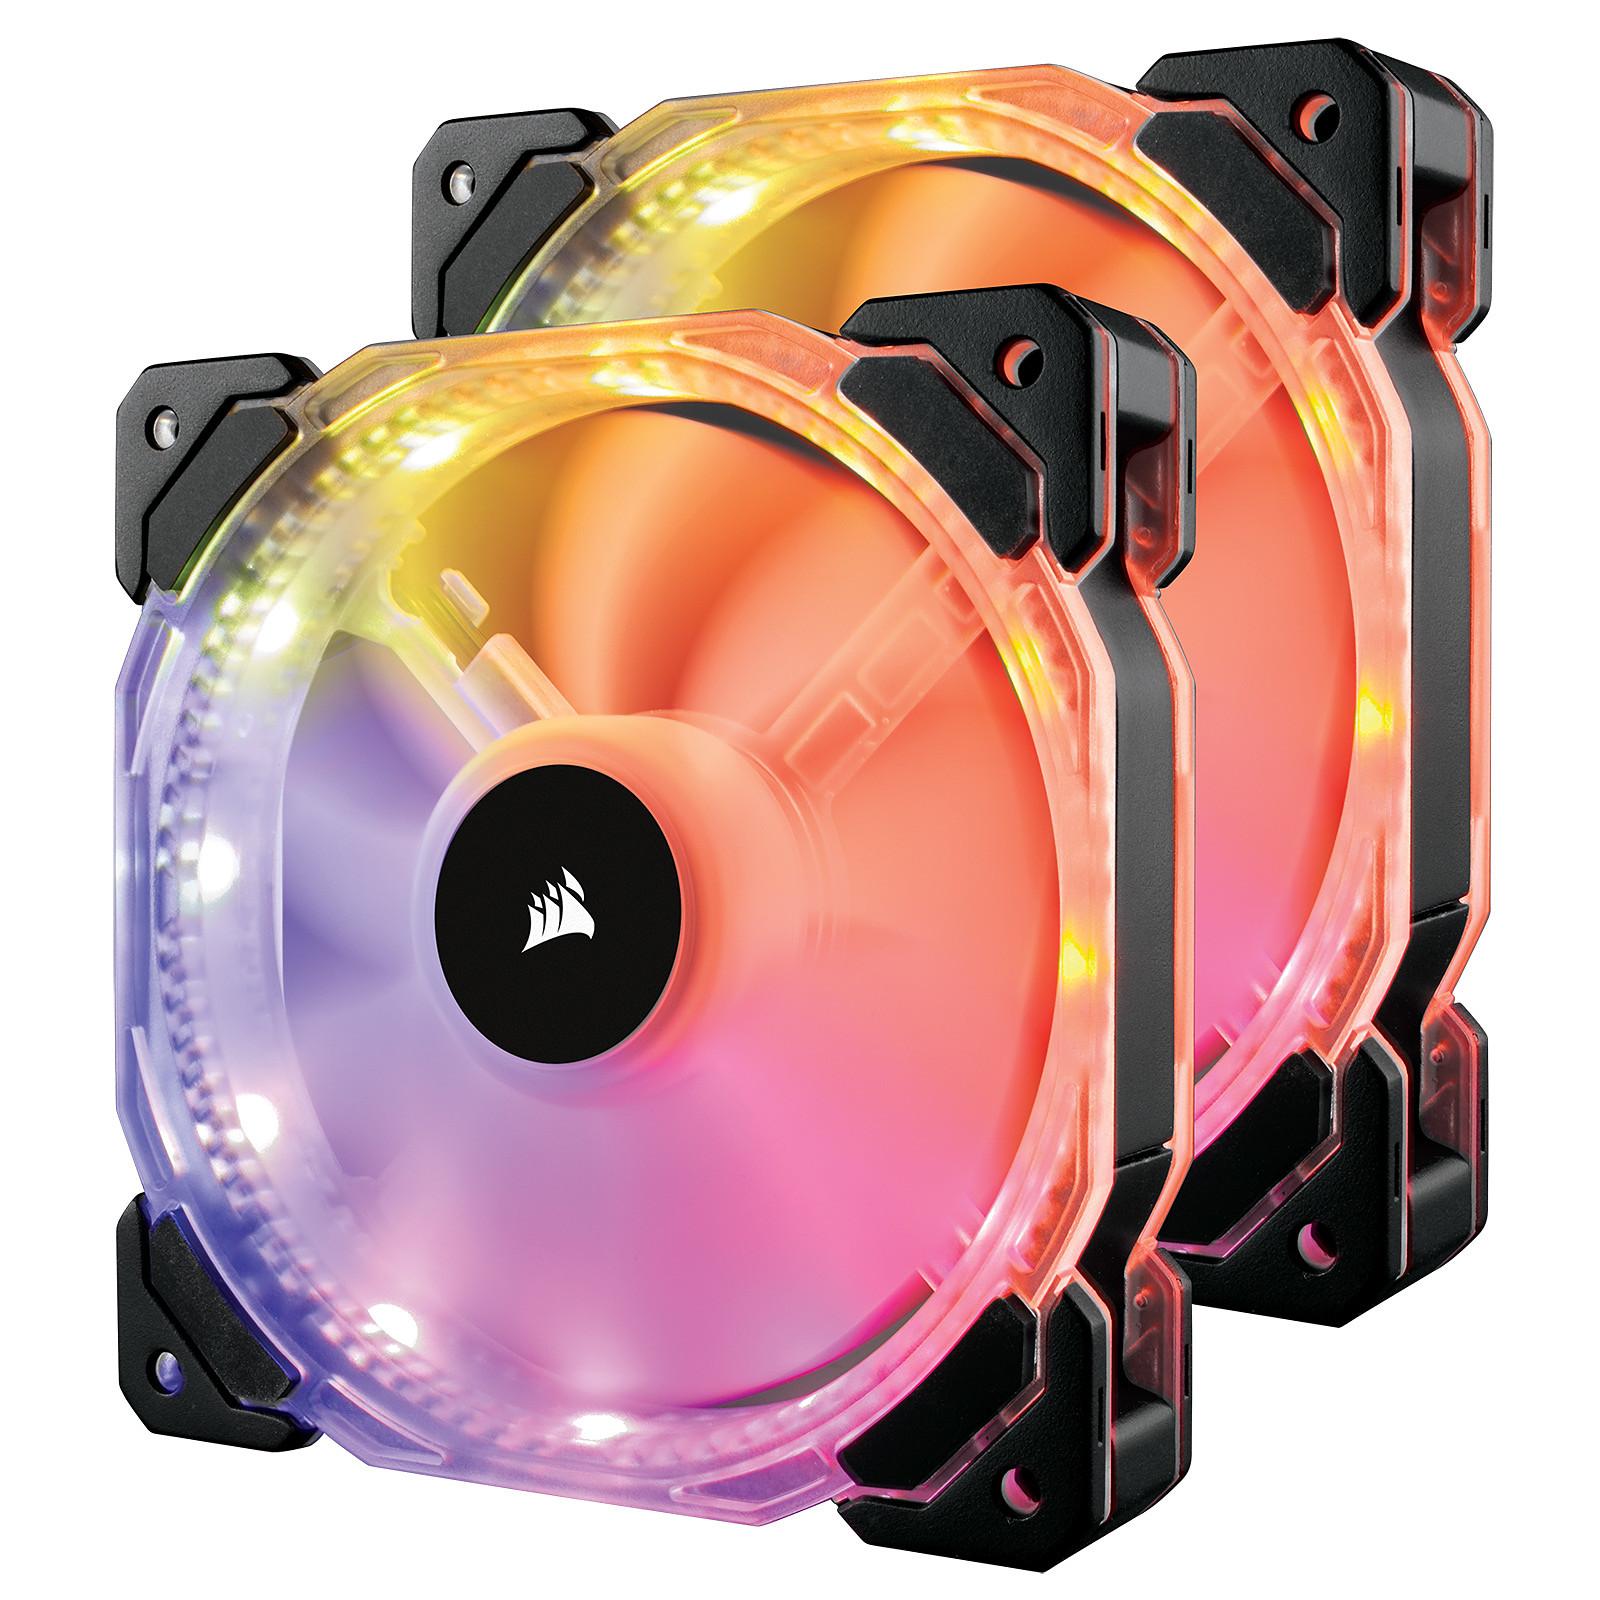 Corsair HD140 RGB LED High Performance with controller (par 2)